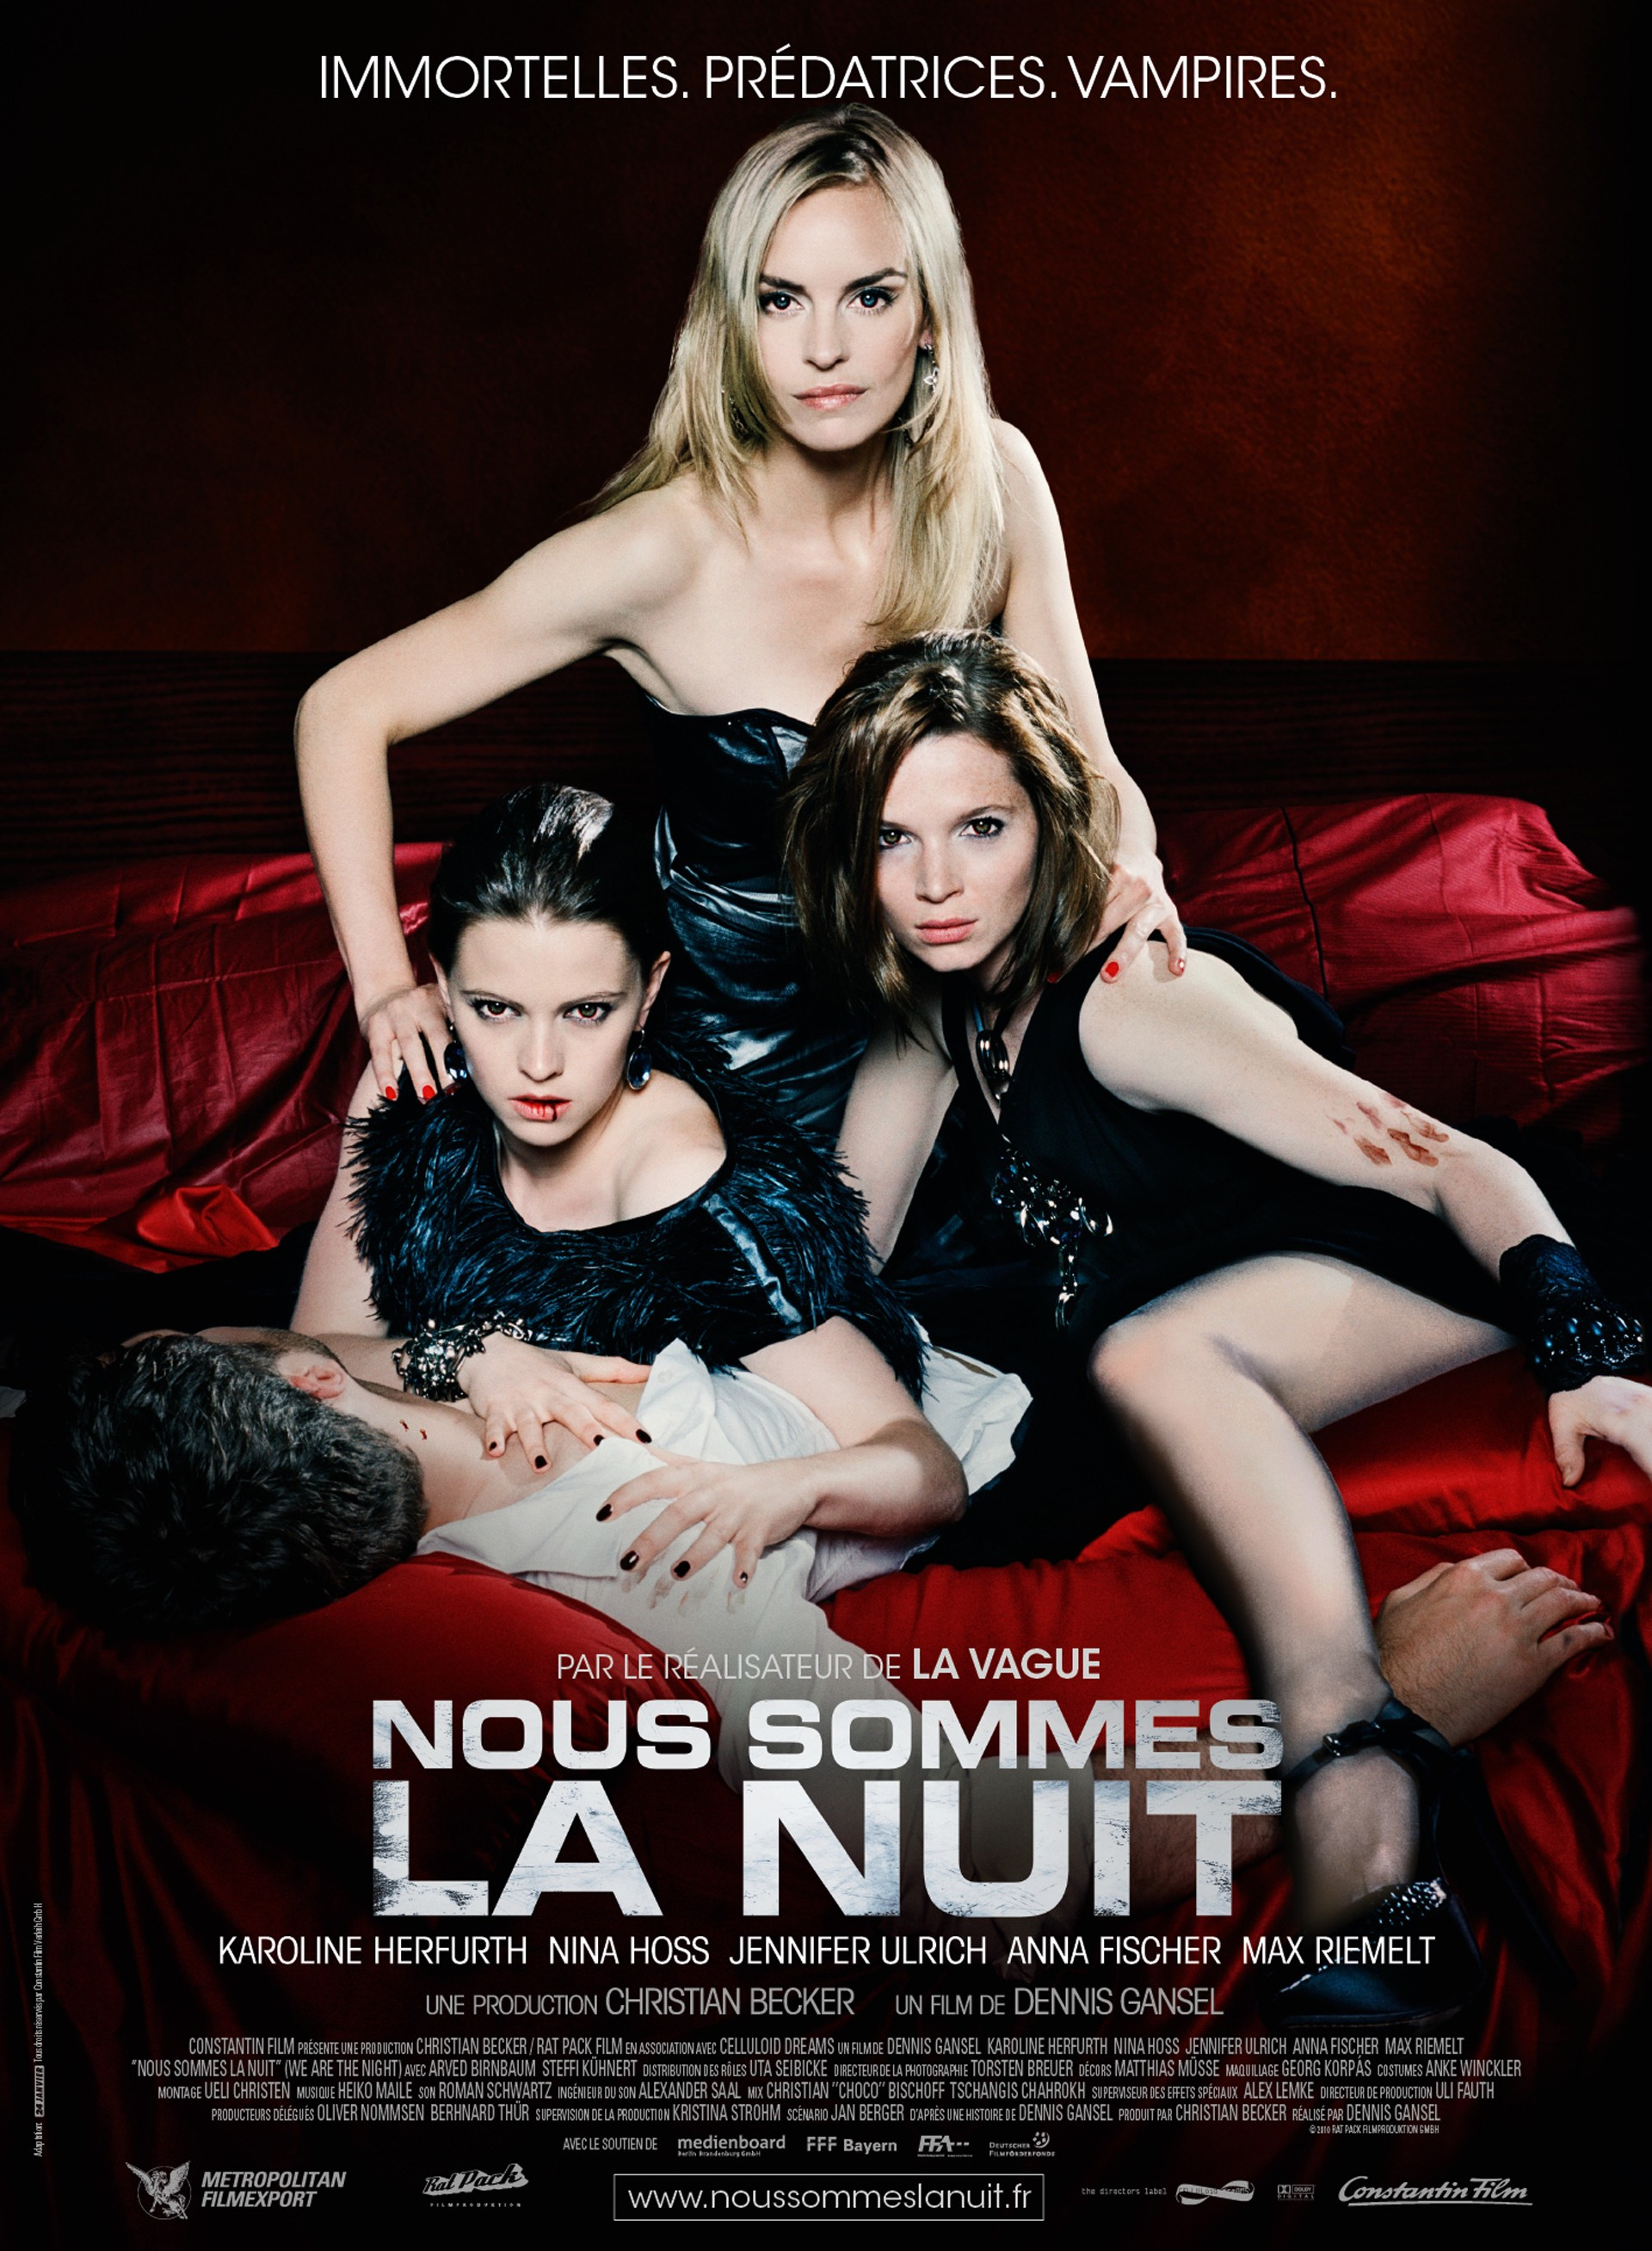 Nous sommes la nuit [DVDRiP][FRENCH] [MULTI]